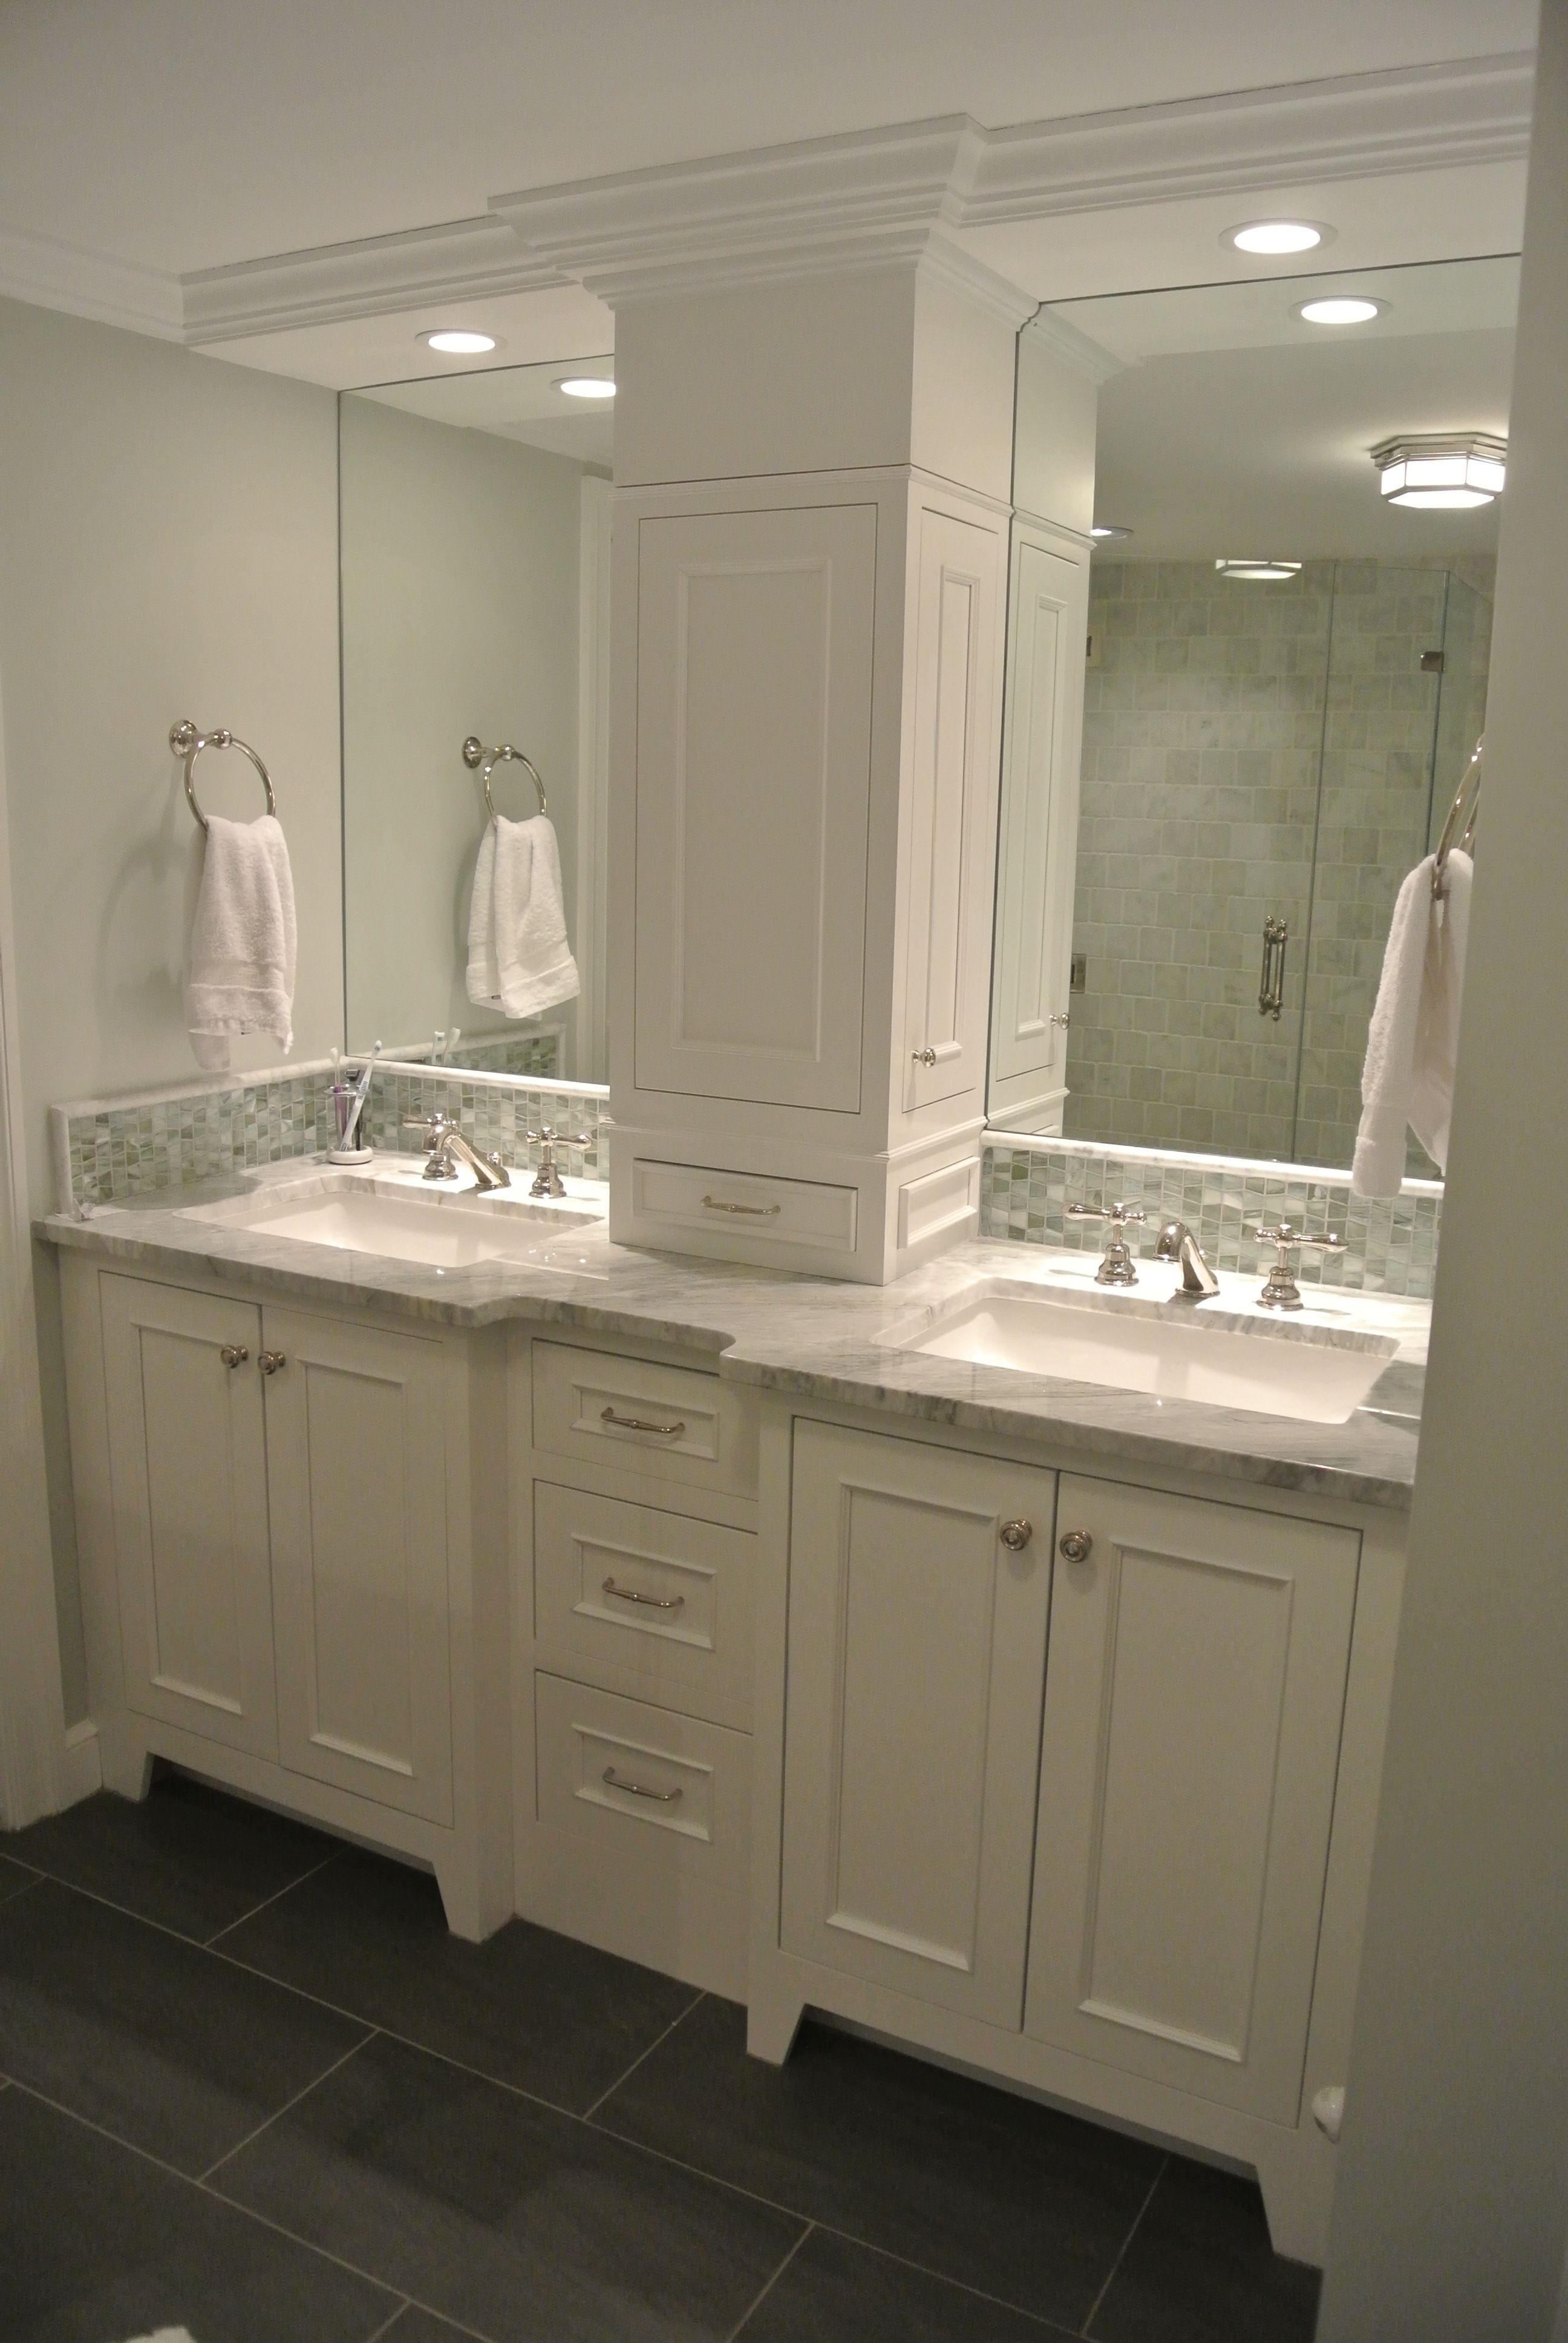 fresh 2 sink bathroom vanity ideas ij15q2 | bathroom counter